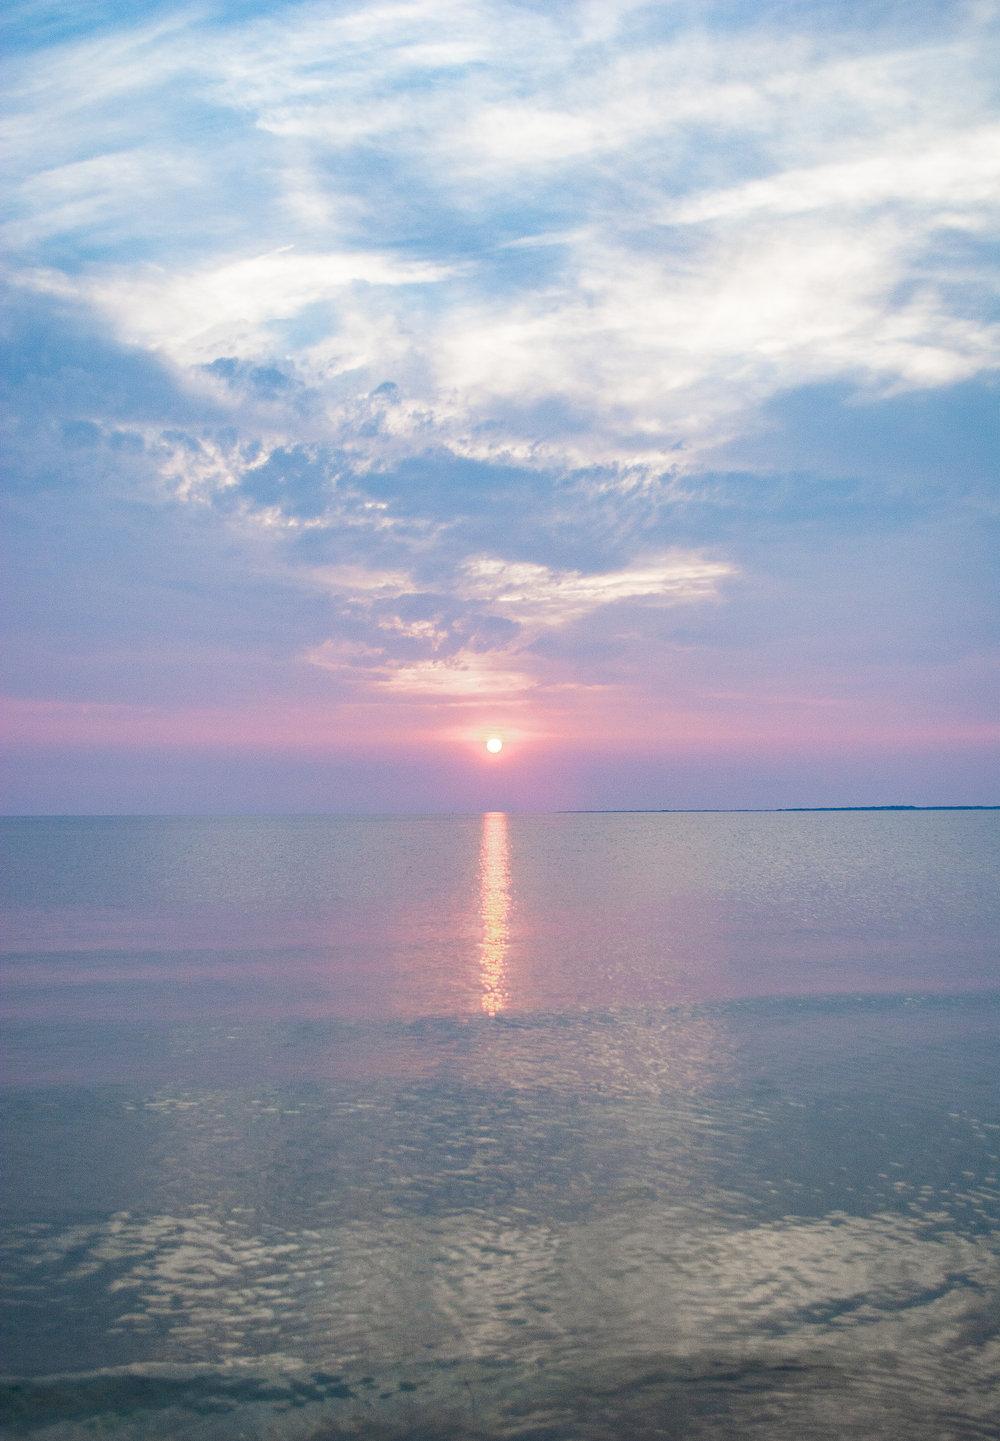 sunset shots (1 of 1).jpg